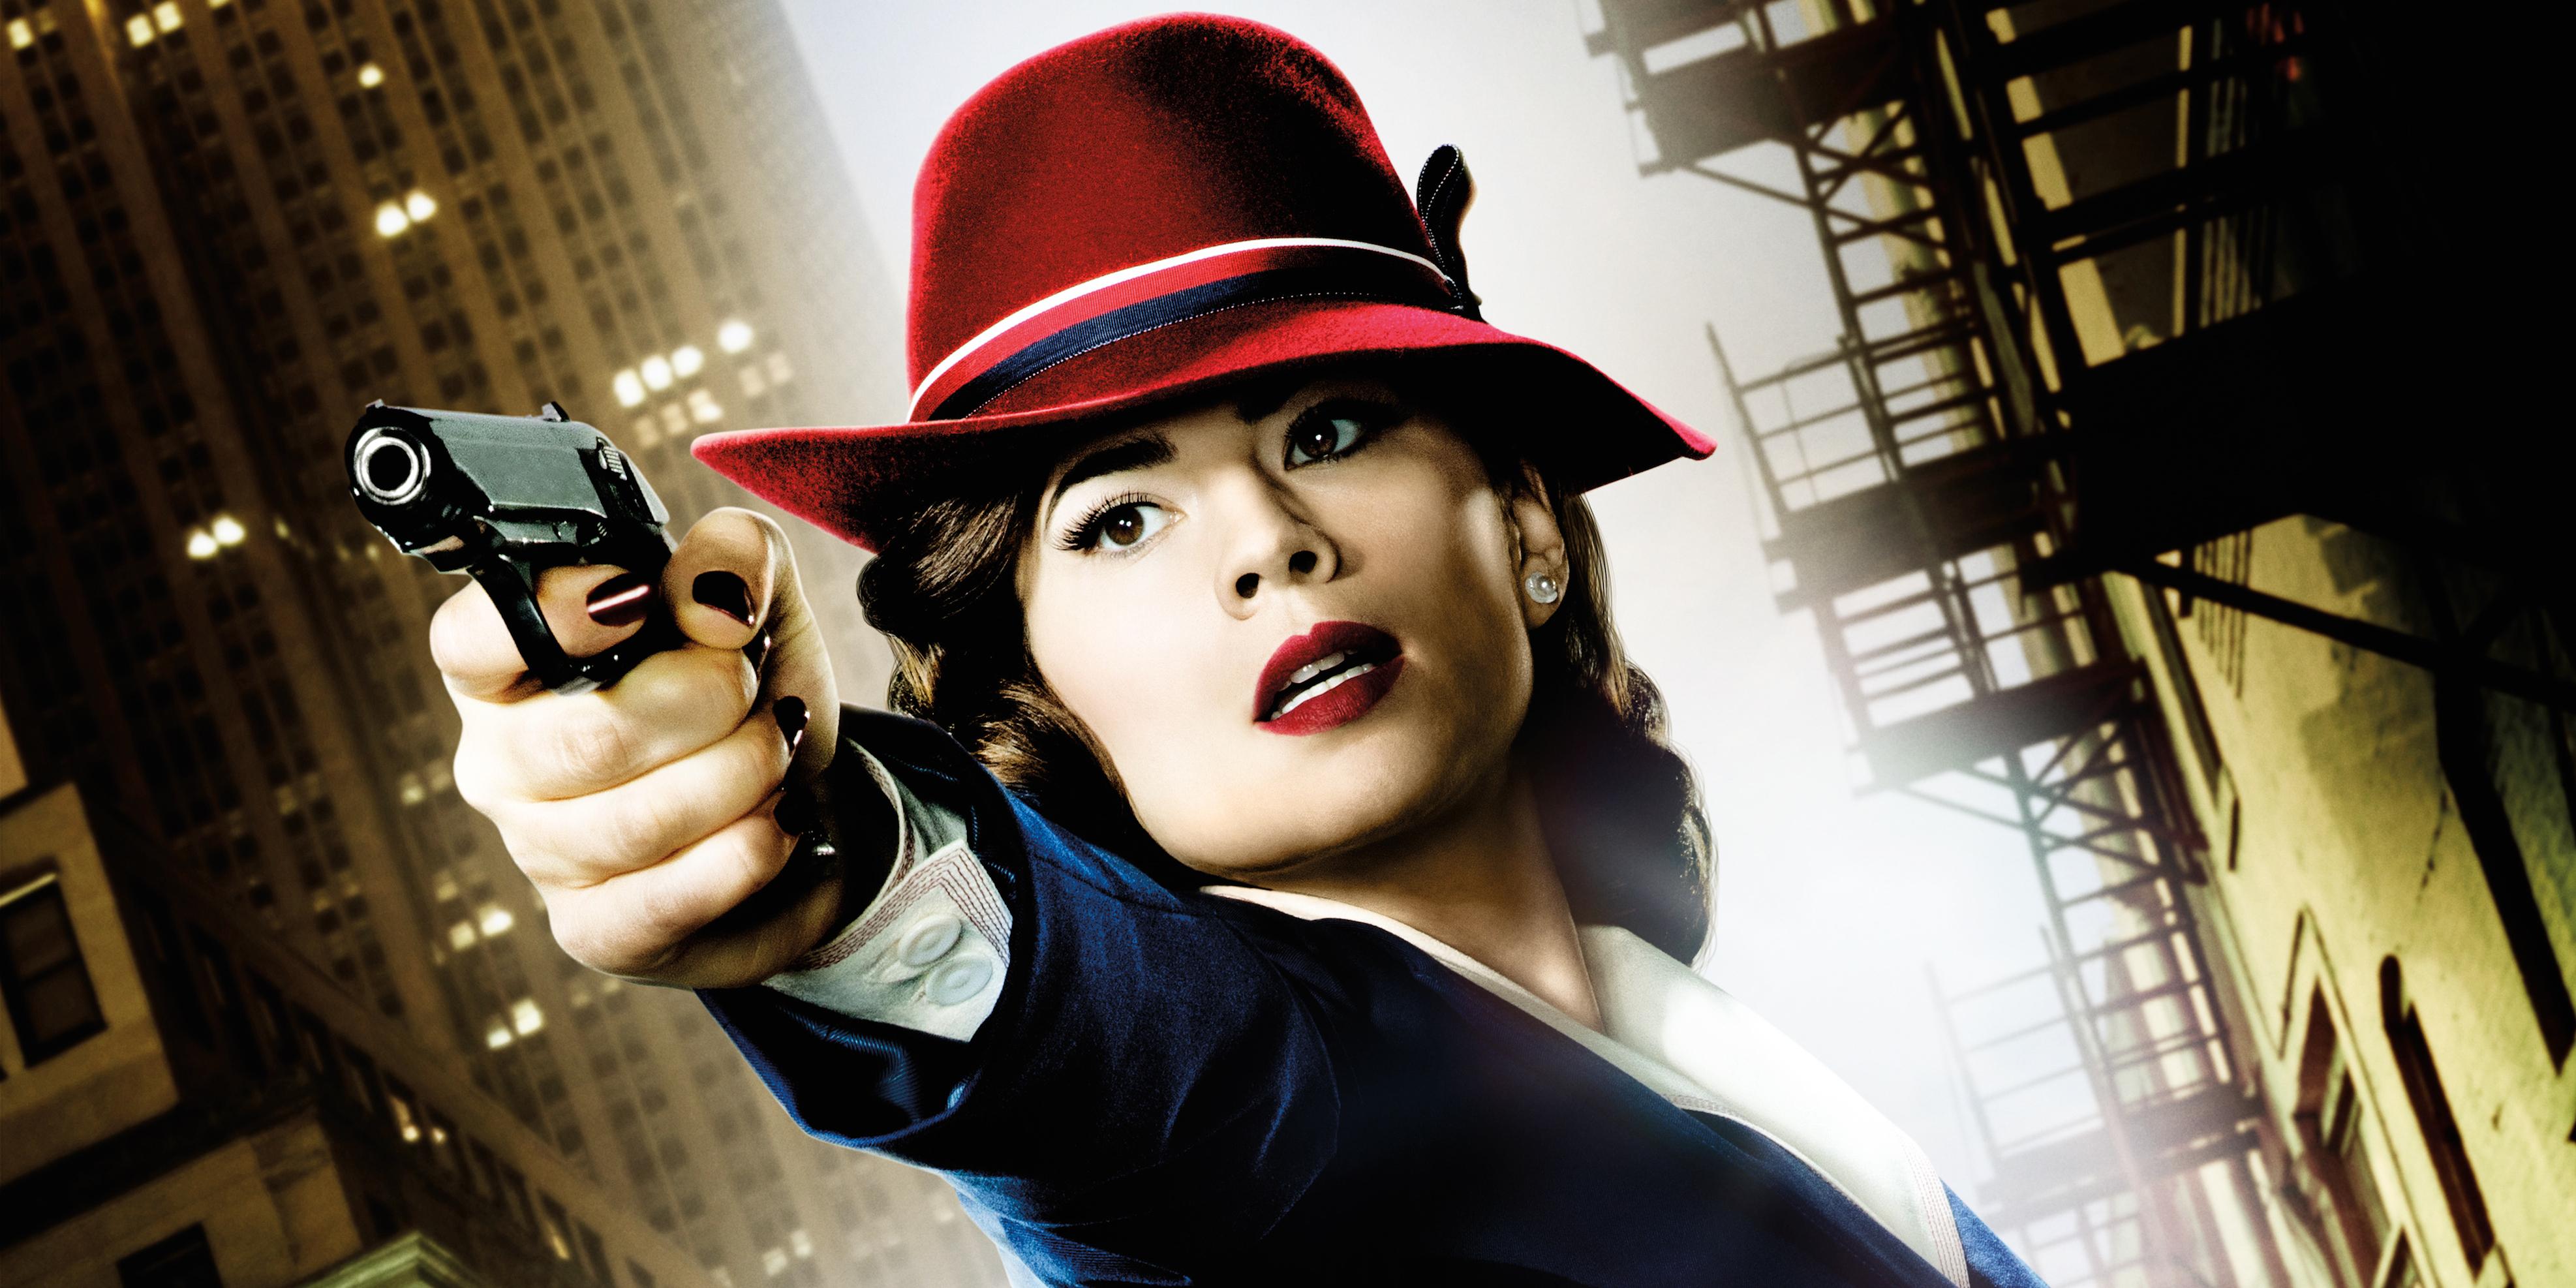 3948x1974 > Agent Carter Wallpapers